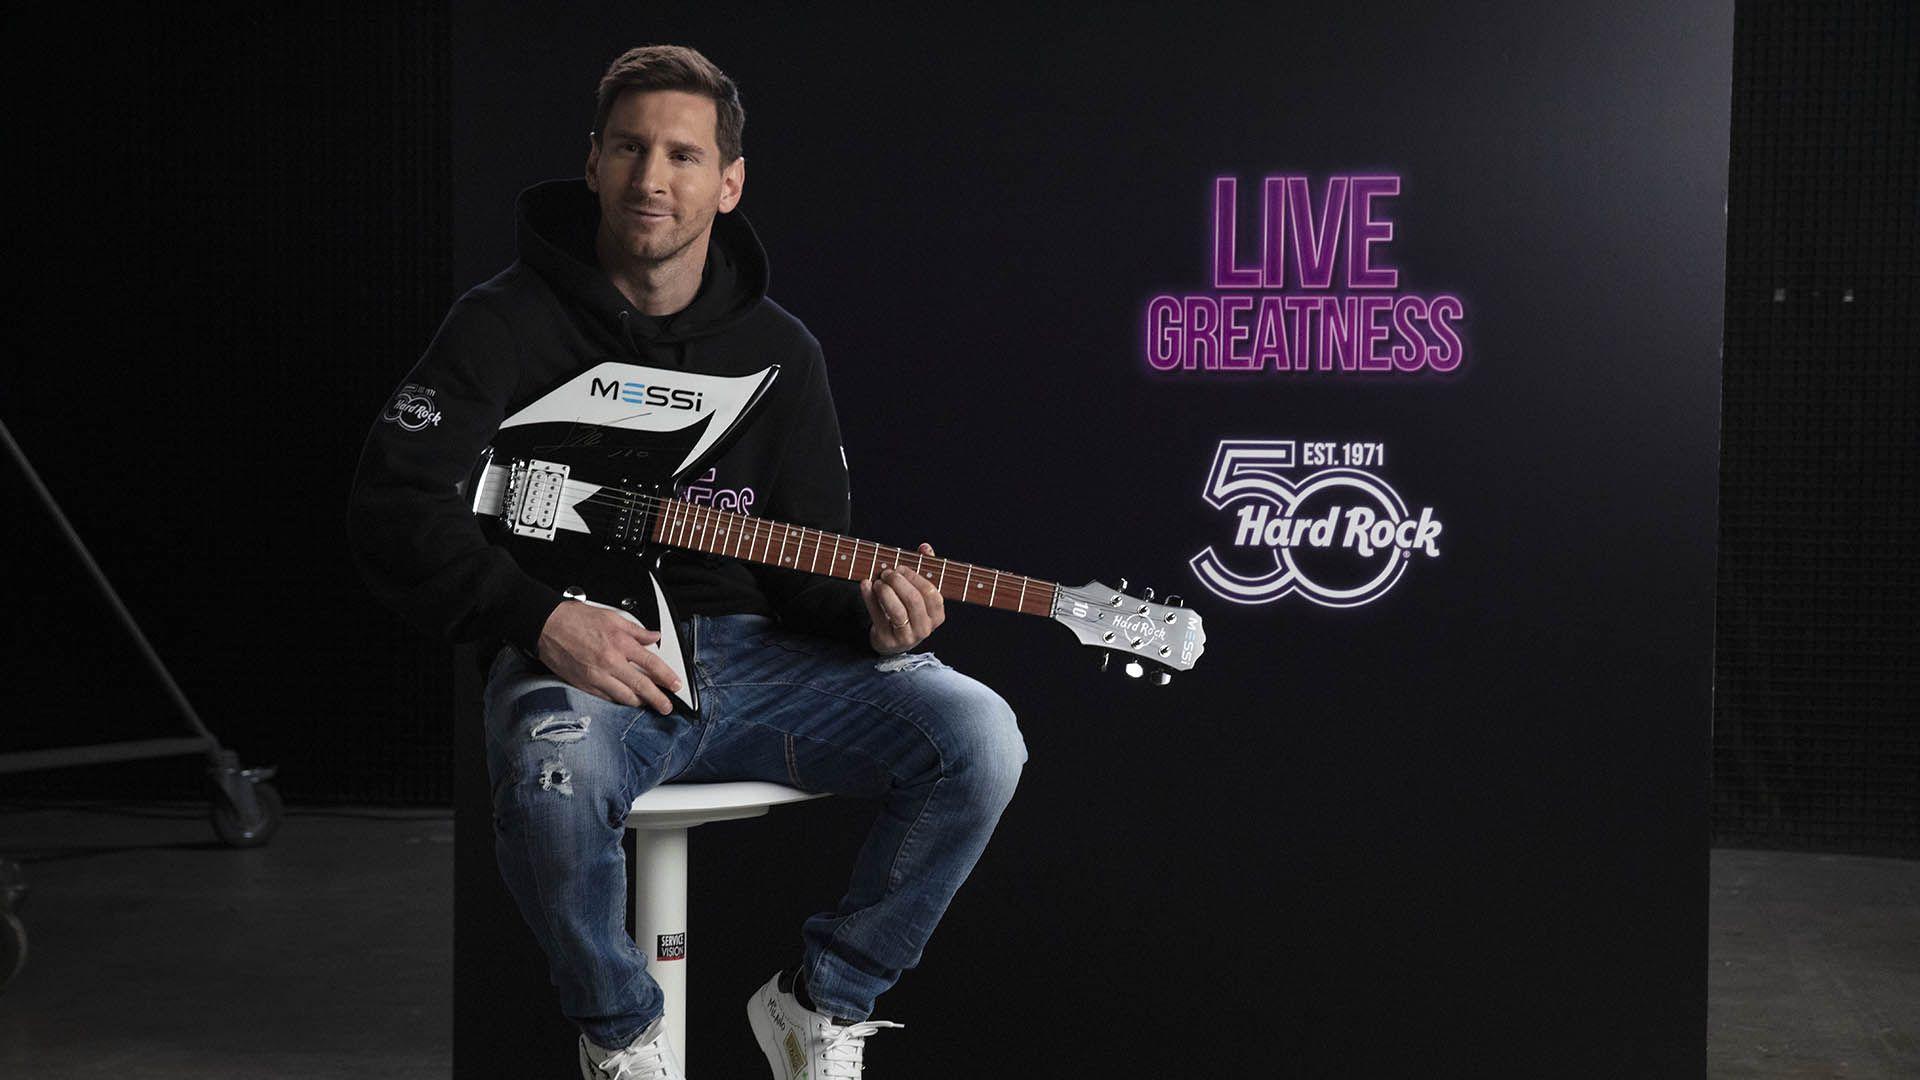 Messi Hard Rock